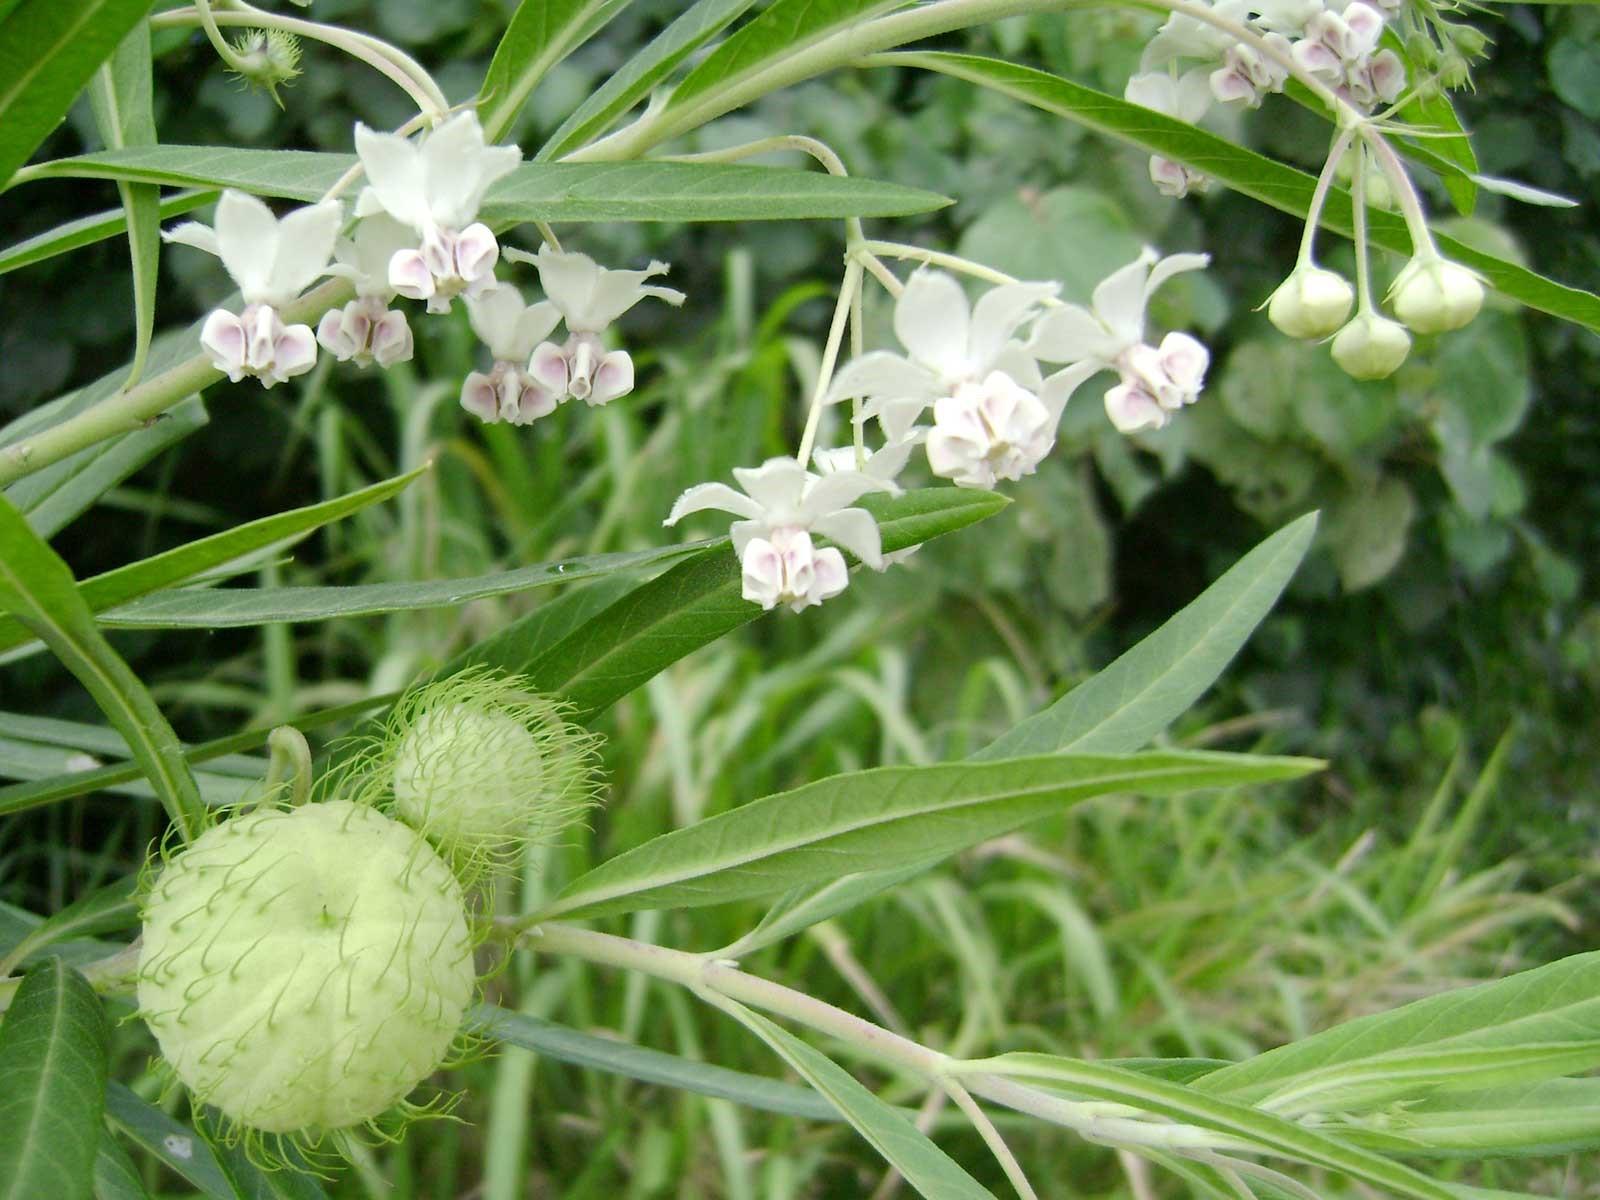 Asclepias physocarpa aka Gomphocarpus physocarpa – Balloon Plant, aka Hairy Balls or Swan Plant